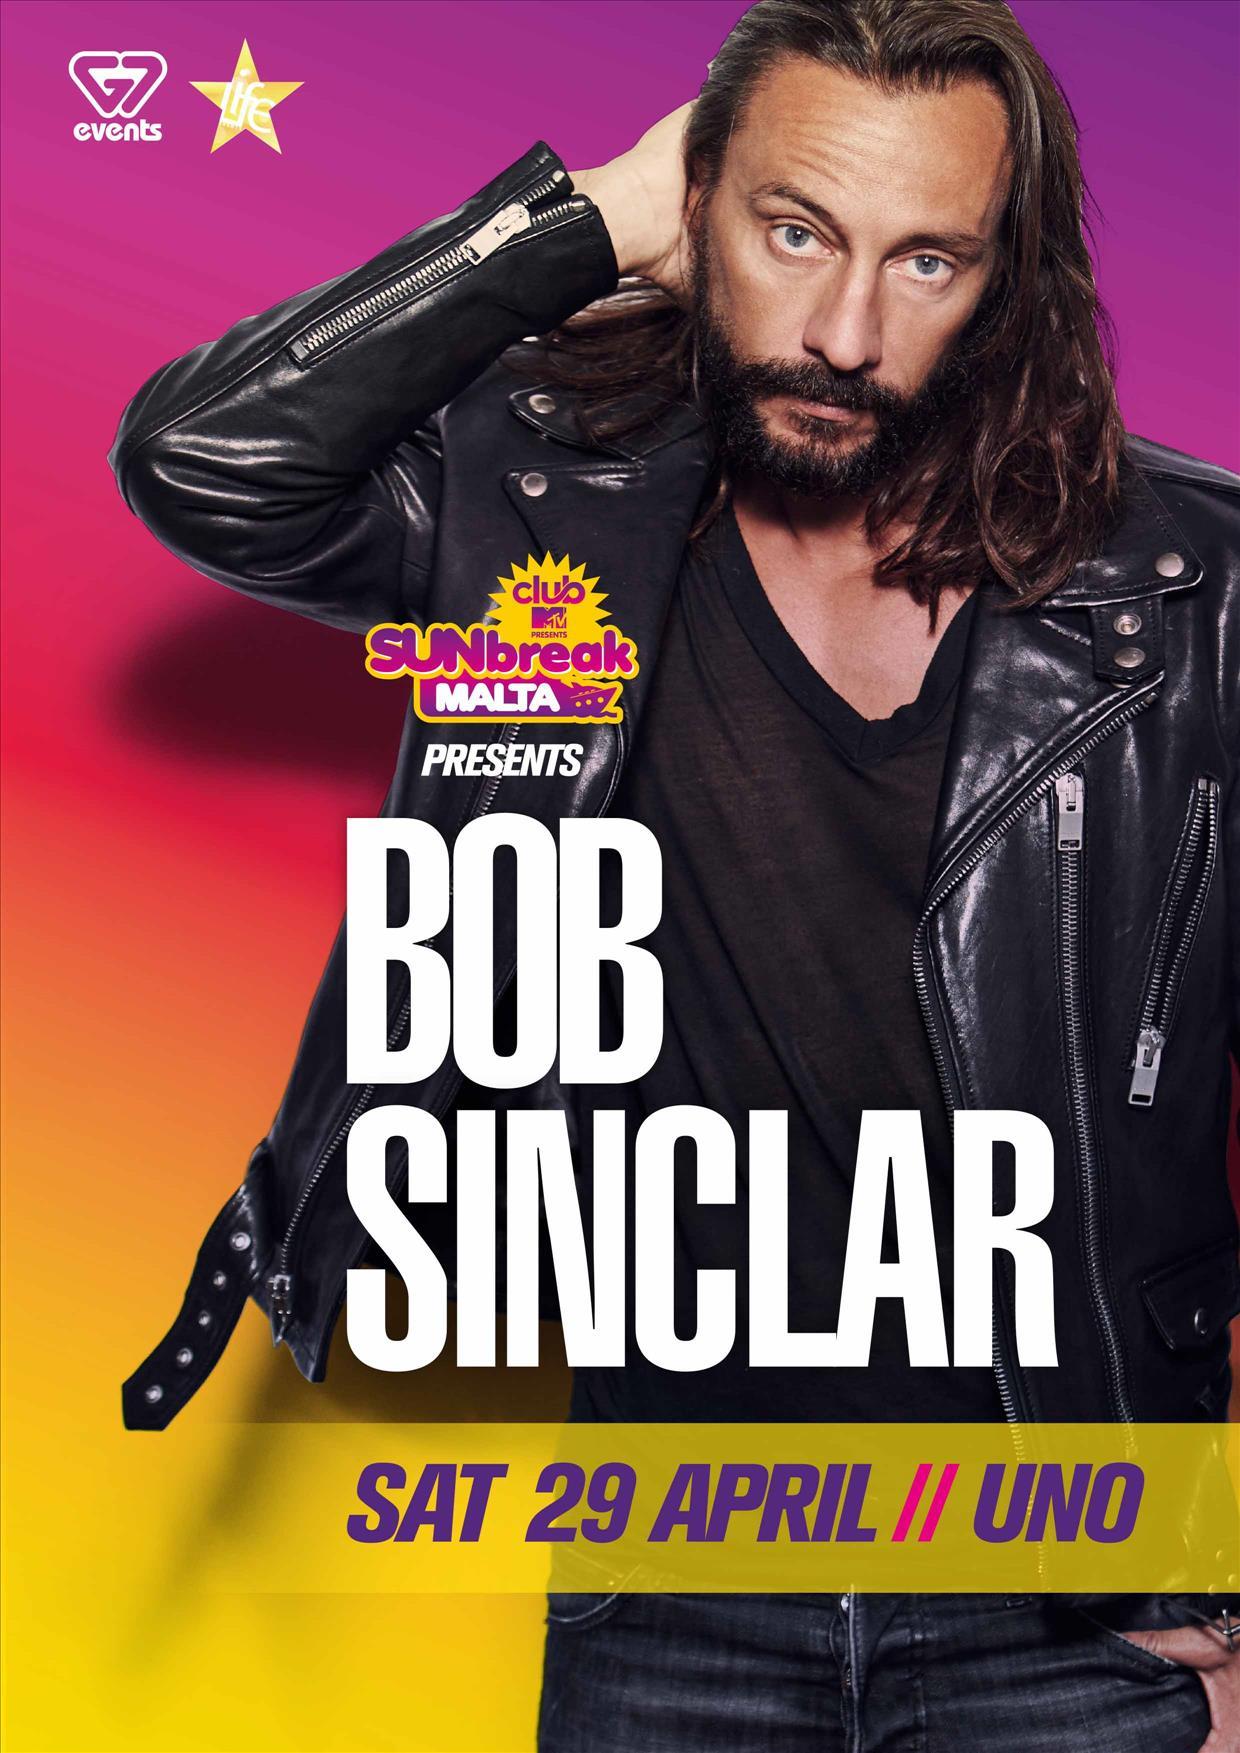 Sunbreak Malta Club MTV Present BOB SINCLAR at UNO flyer